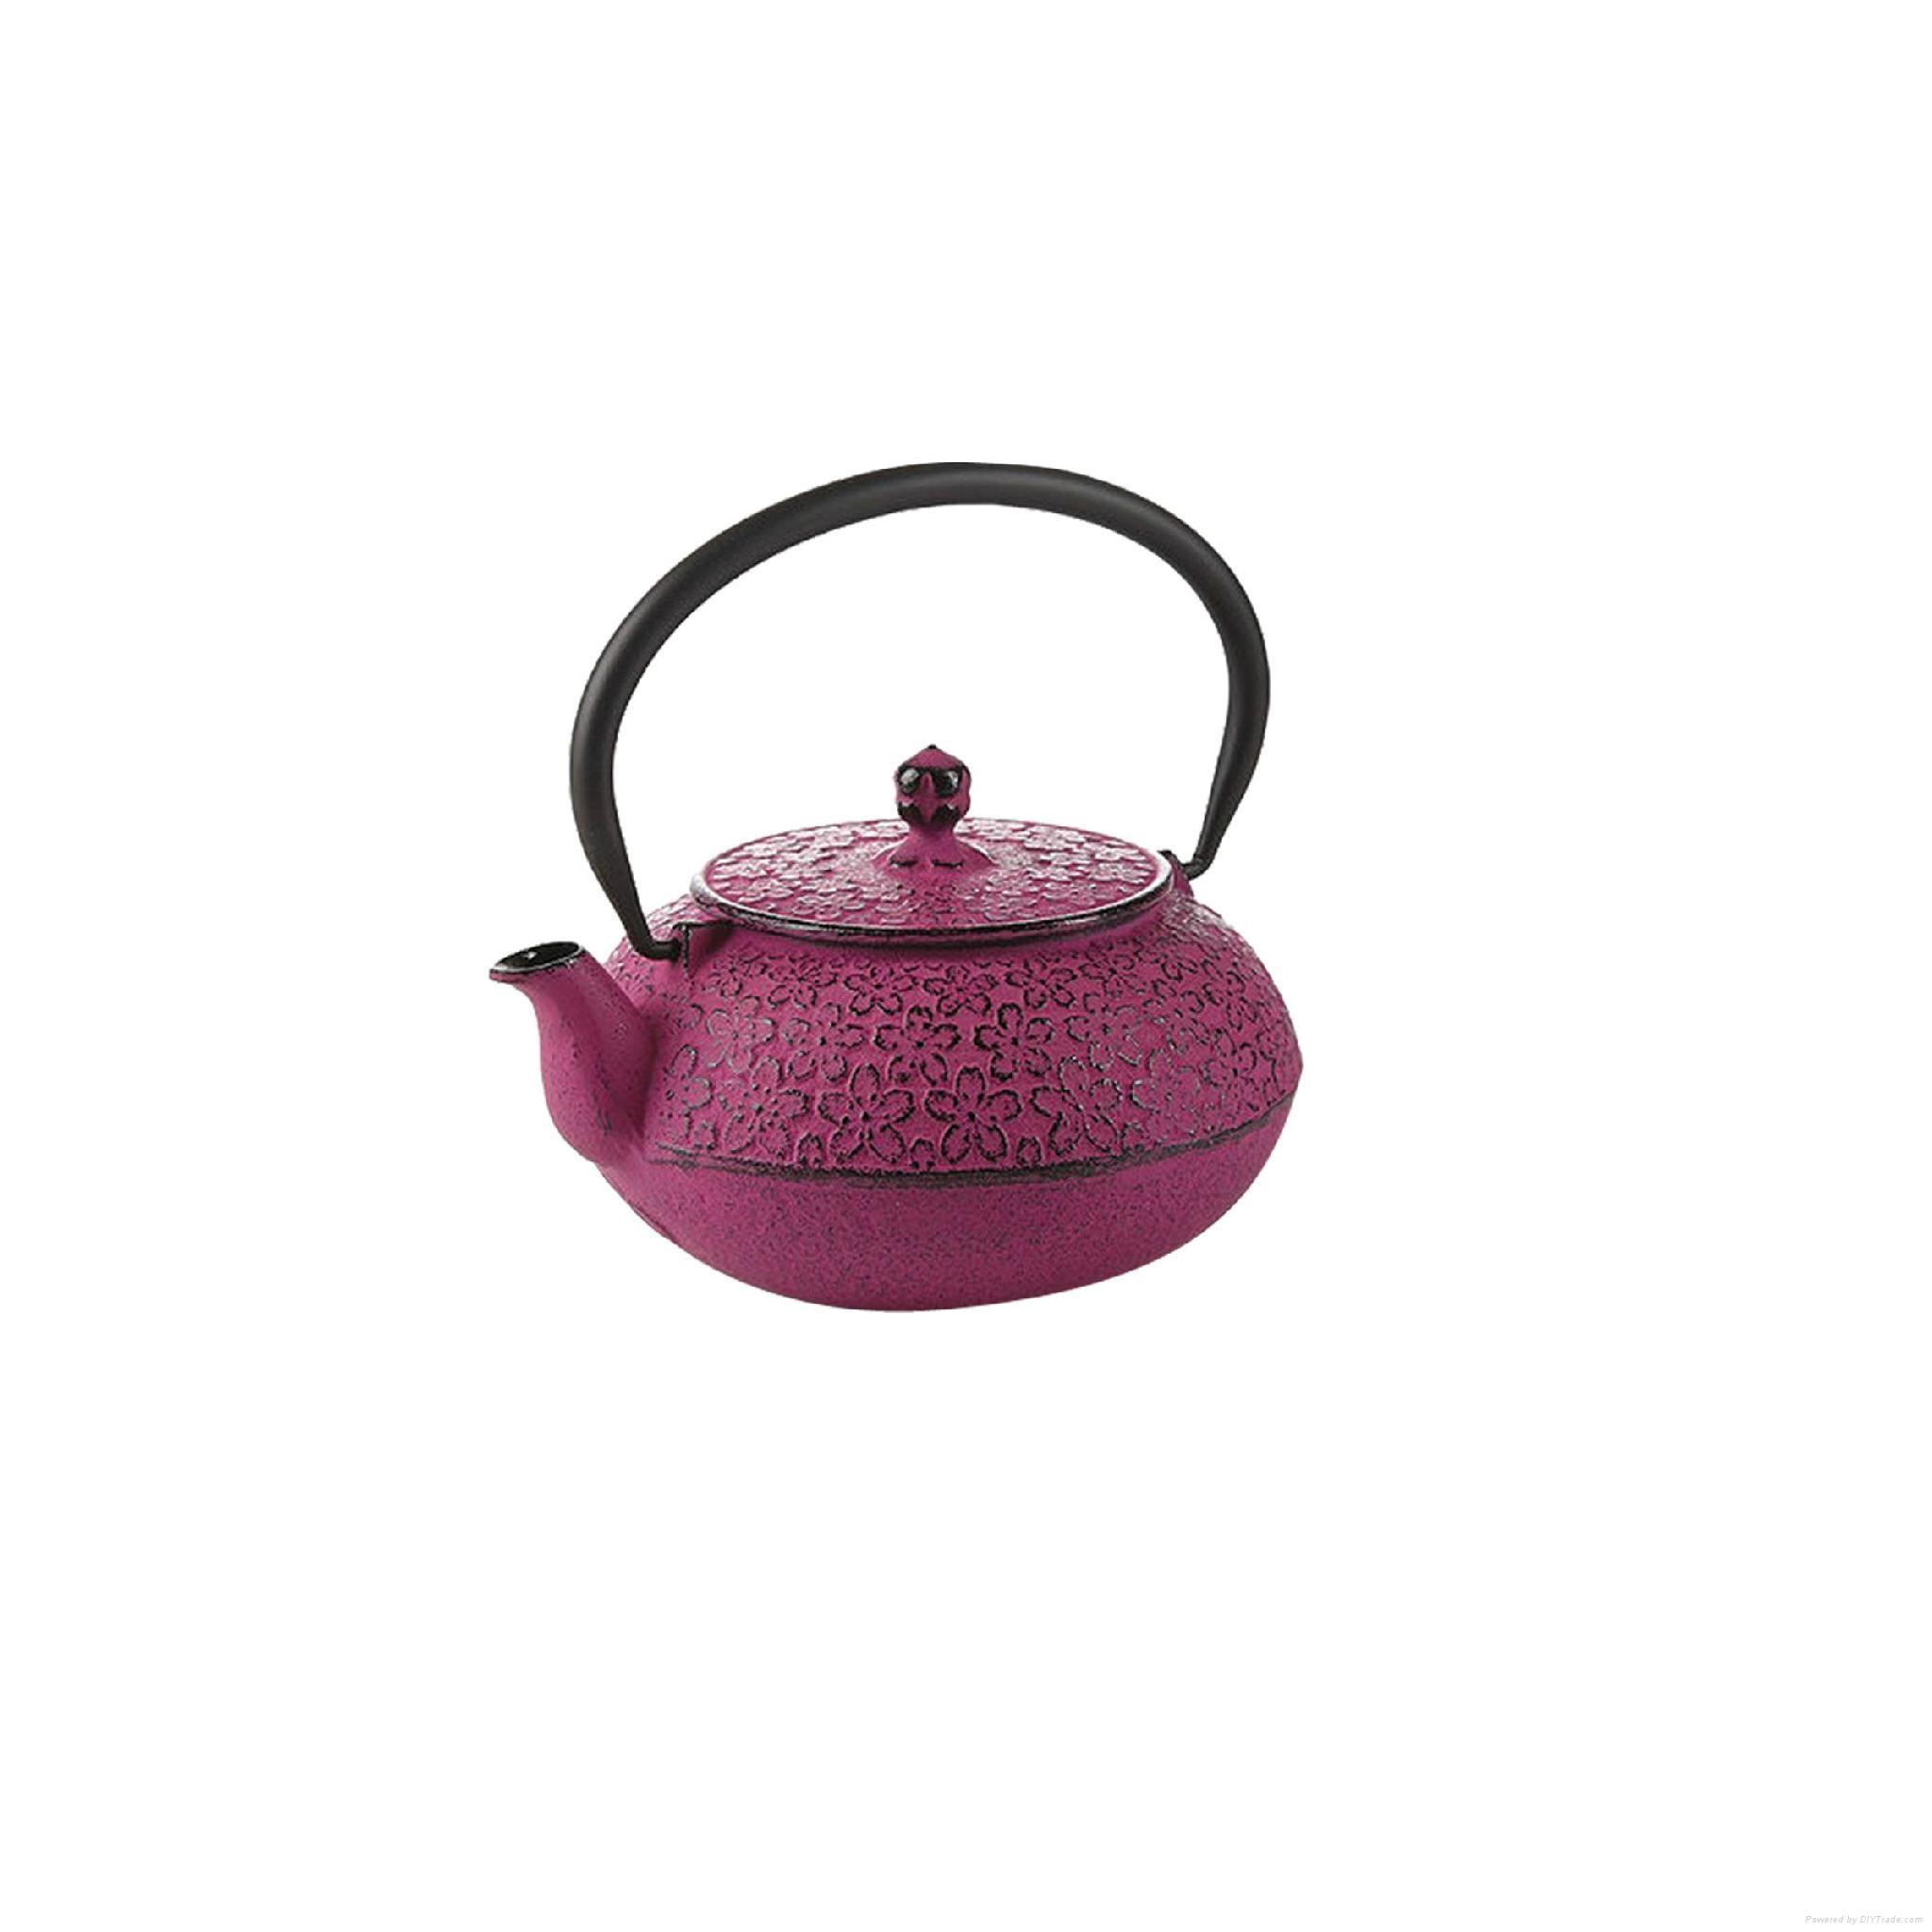 Cherry Blossom Cast Iron Teapot 1